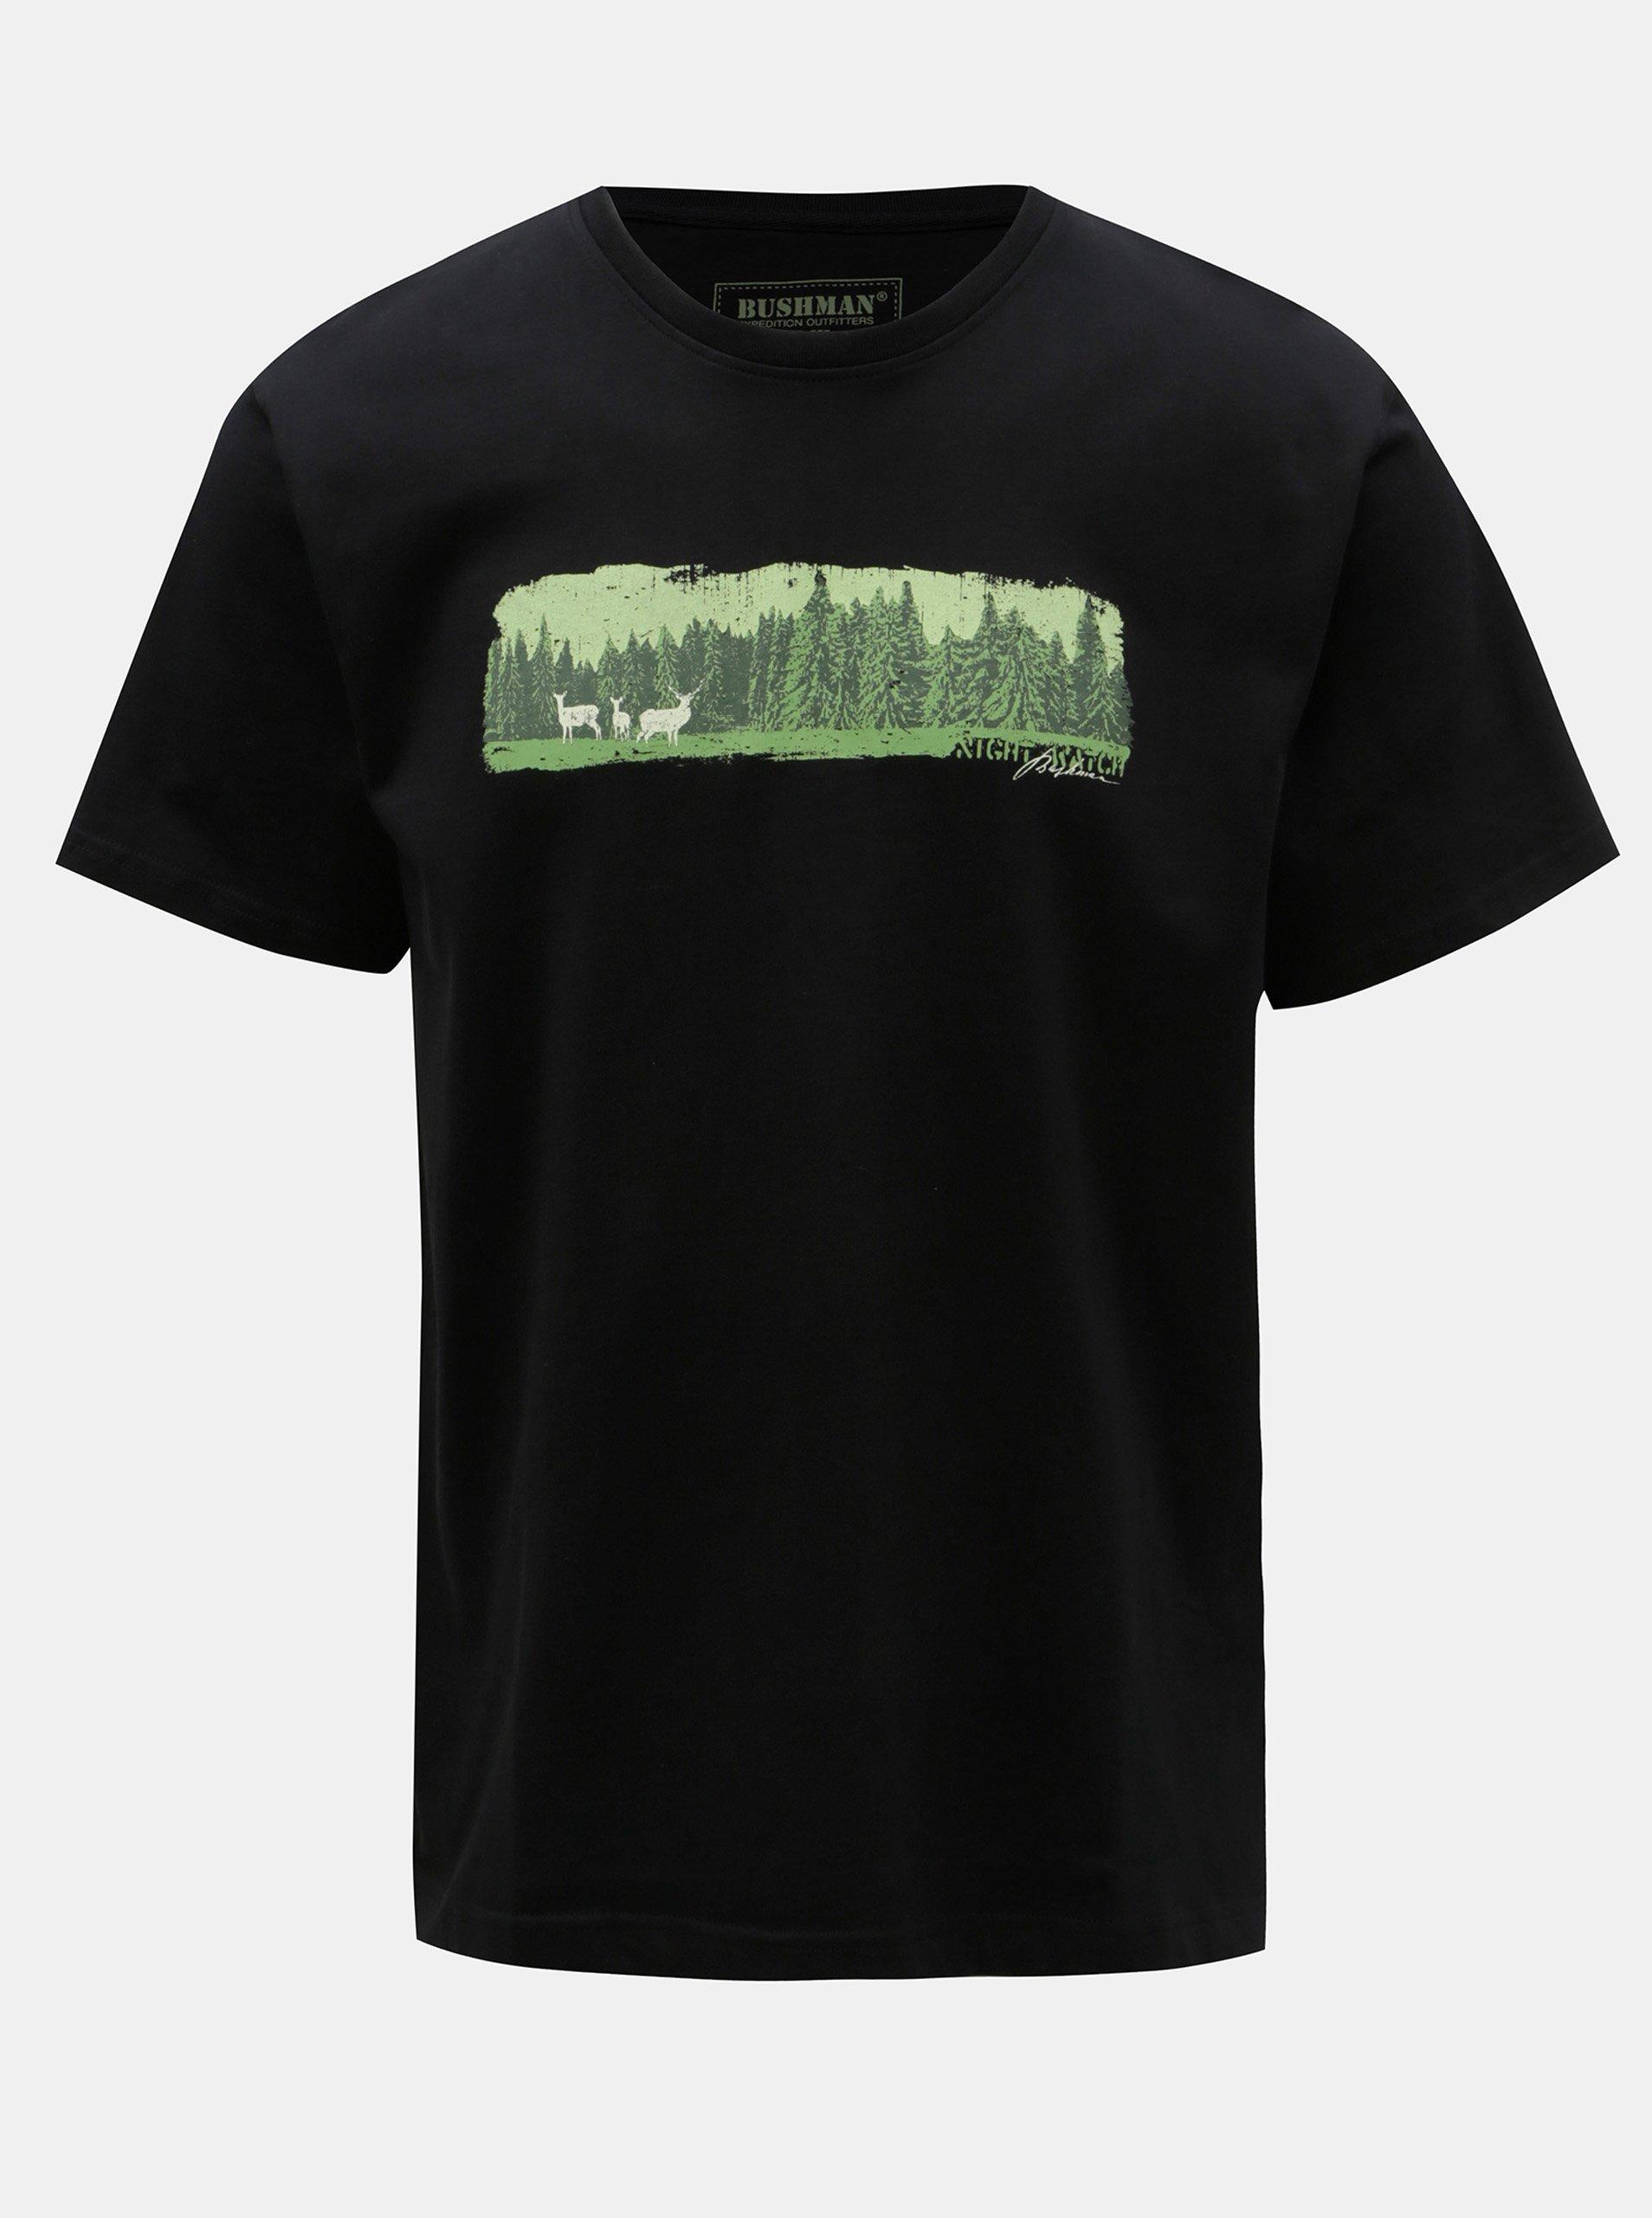 66e70b23a94 Černé pánské tričko s potiskem BUSHMAN Dawson